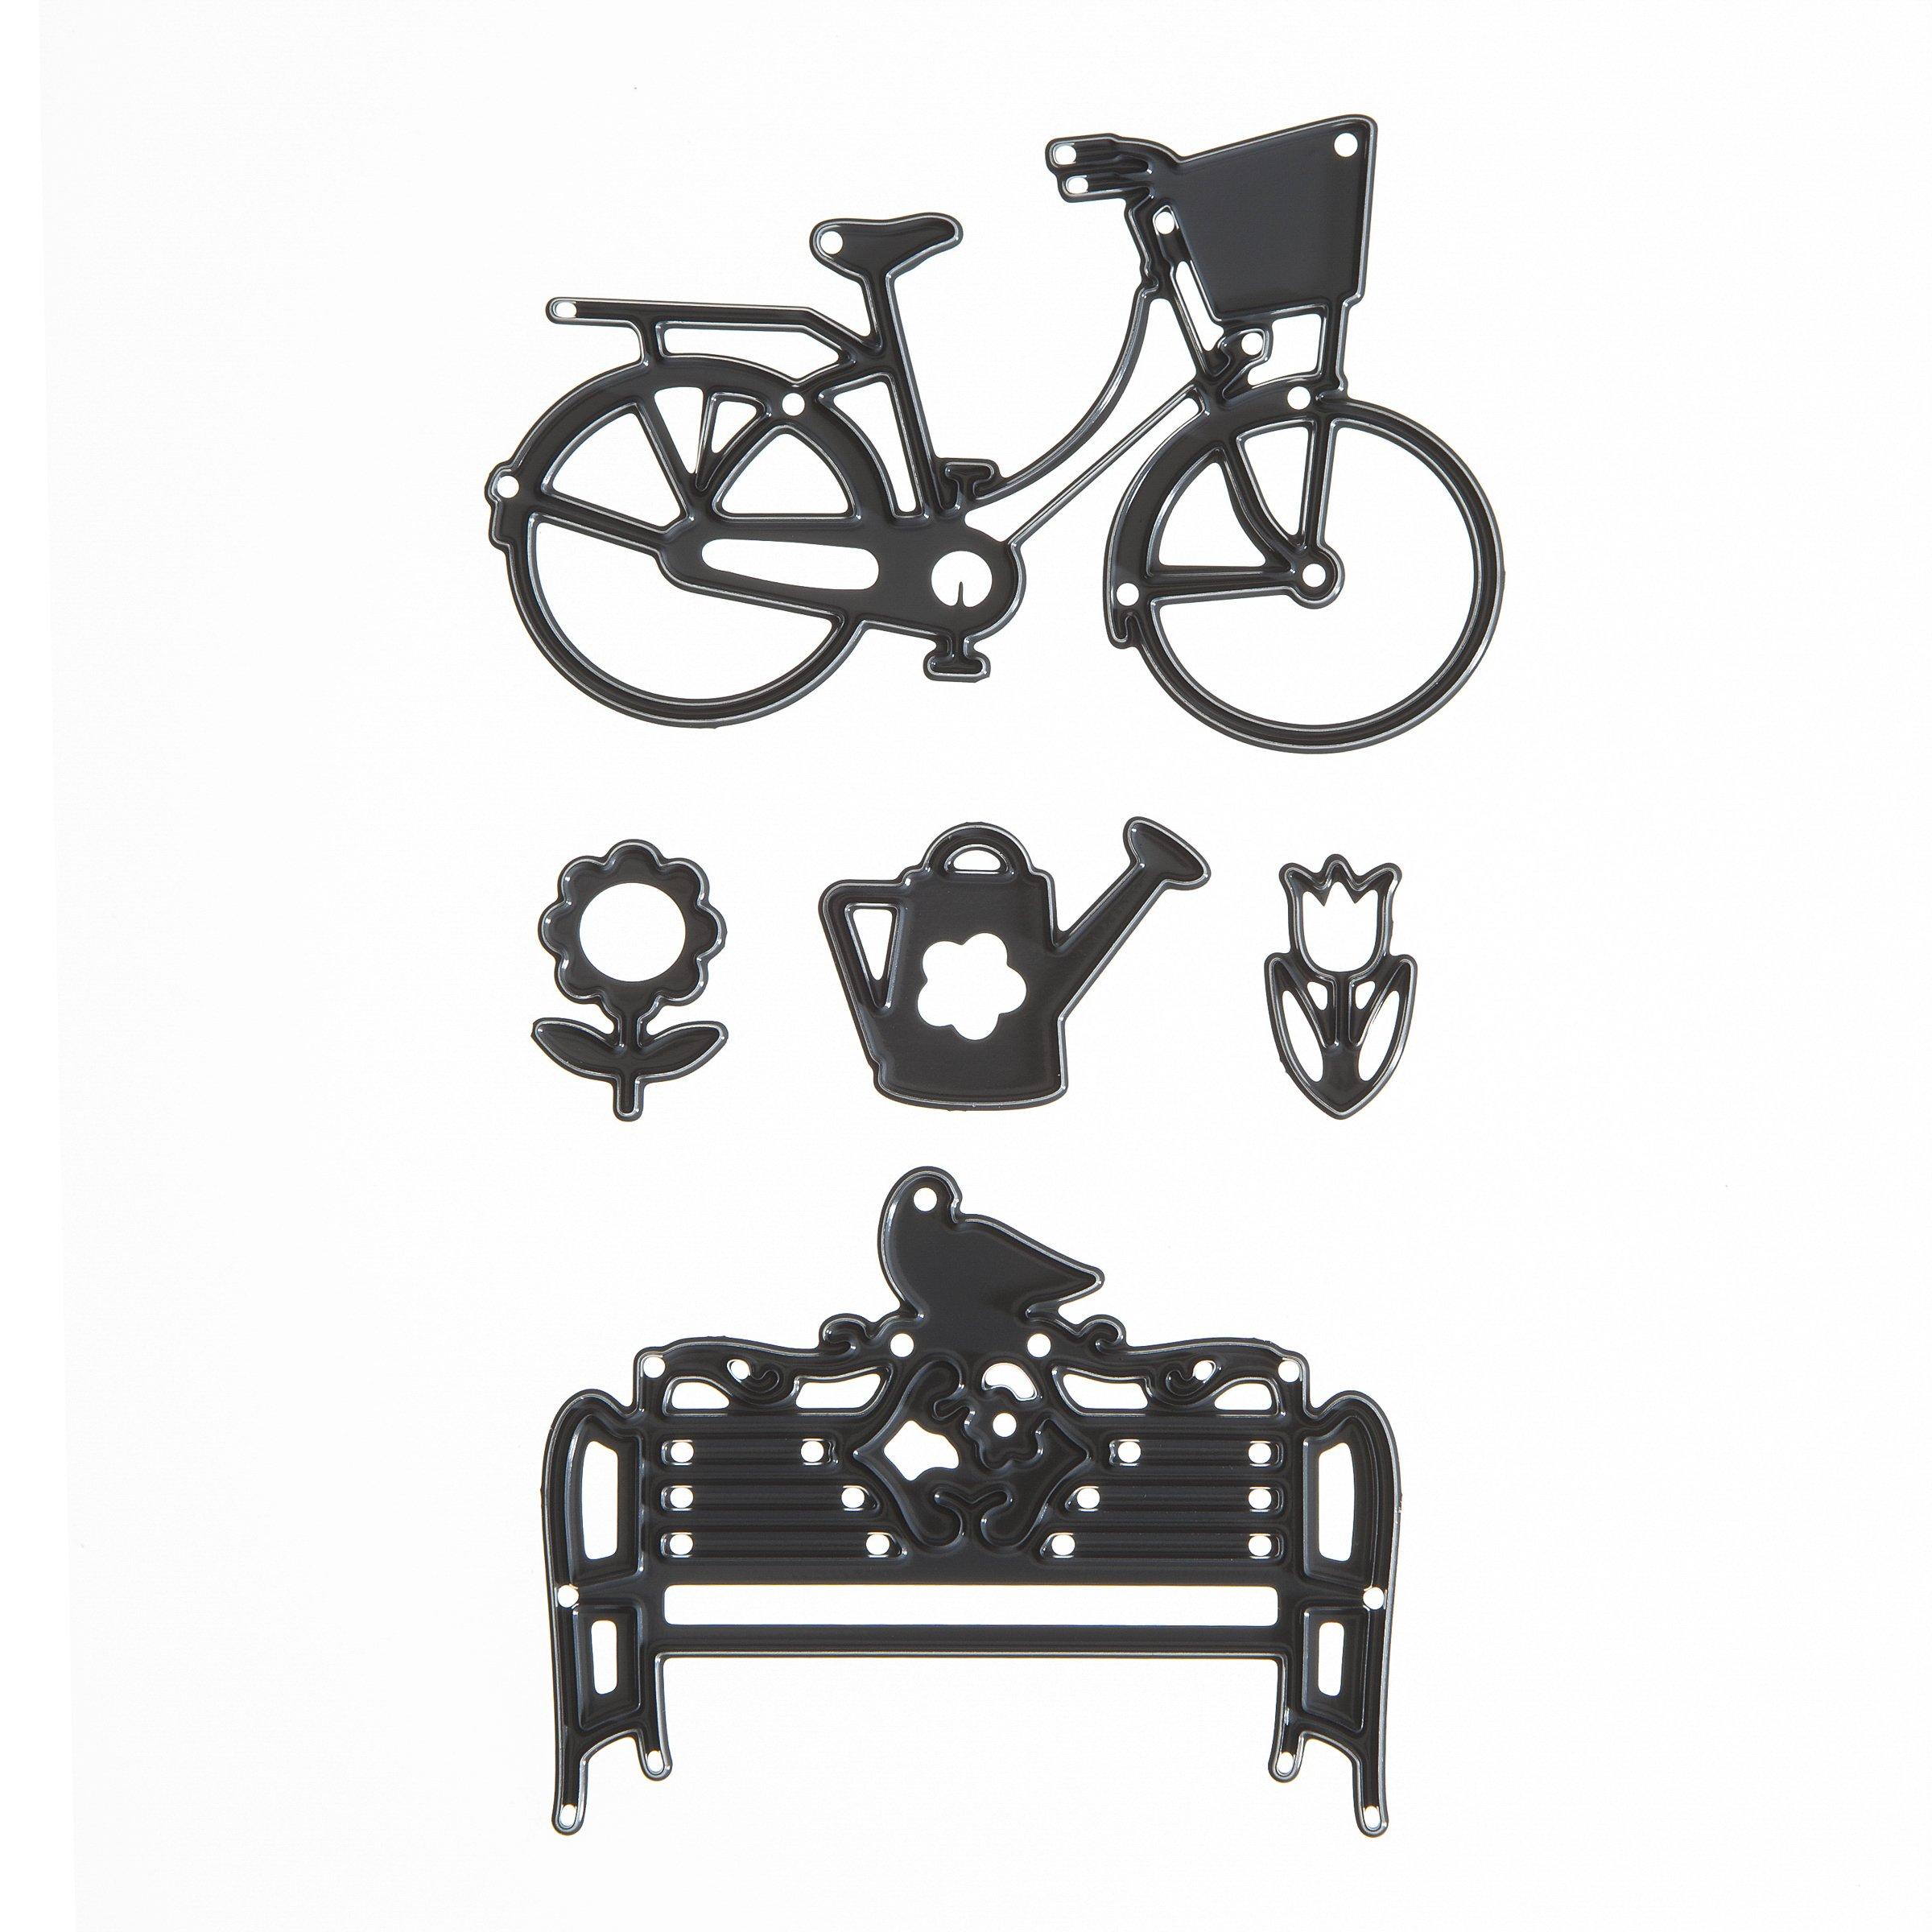 Darice Build-a-Design Craft Dies Outdoor Bicycle & Bench Scene Die Cuts, 5 Piece